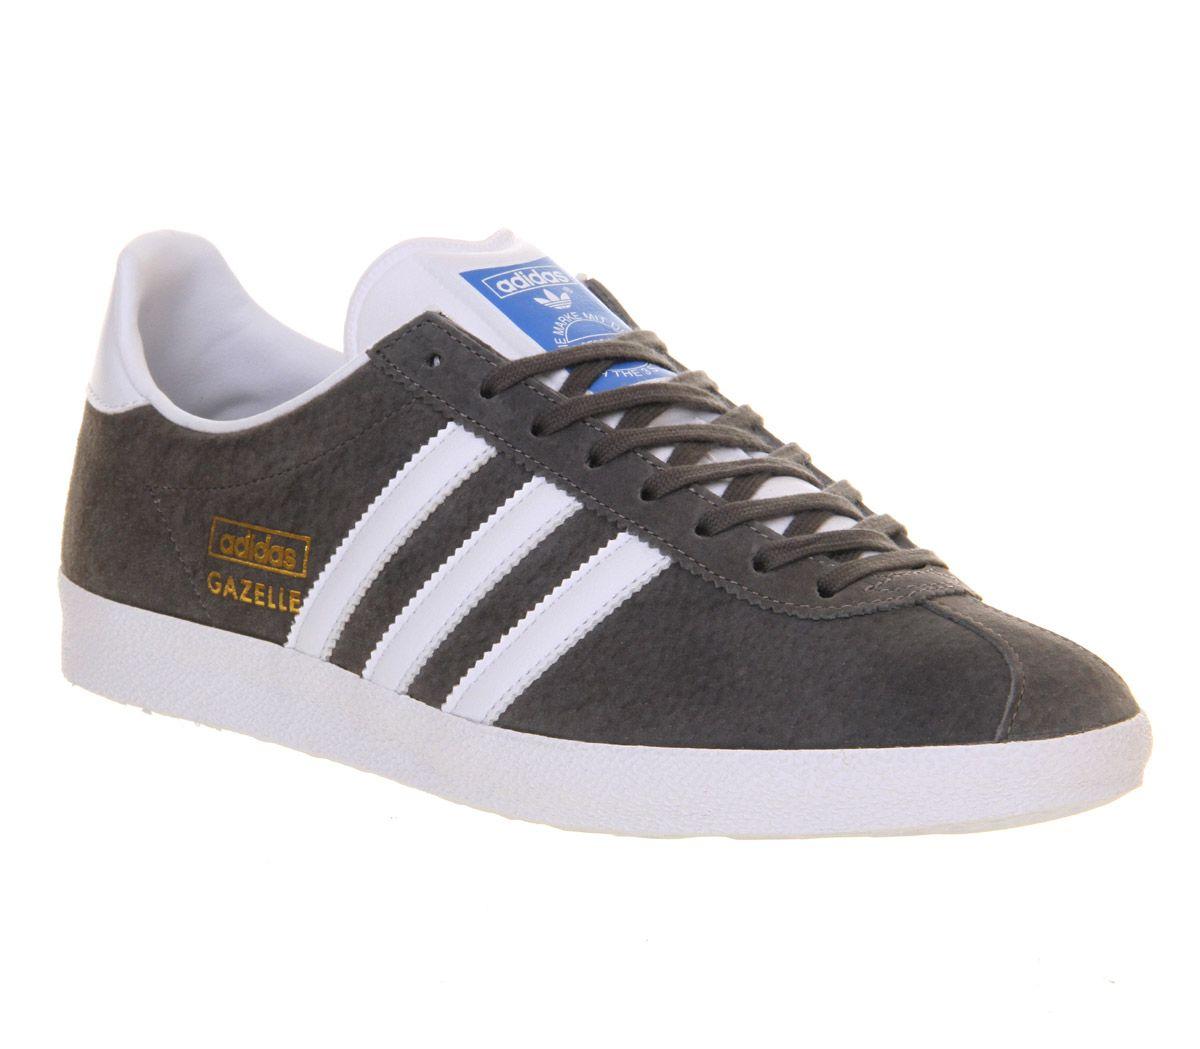 Mens Adidas Gazelle Og SHARP GREY WHITE Trainers Shoes